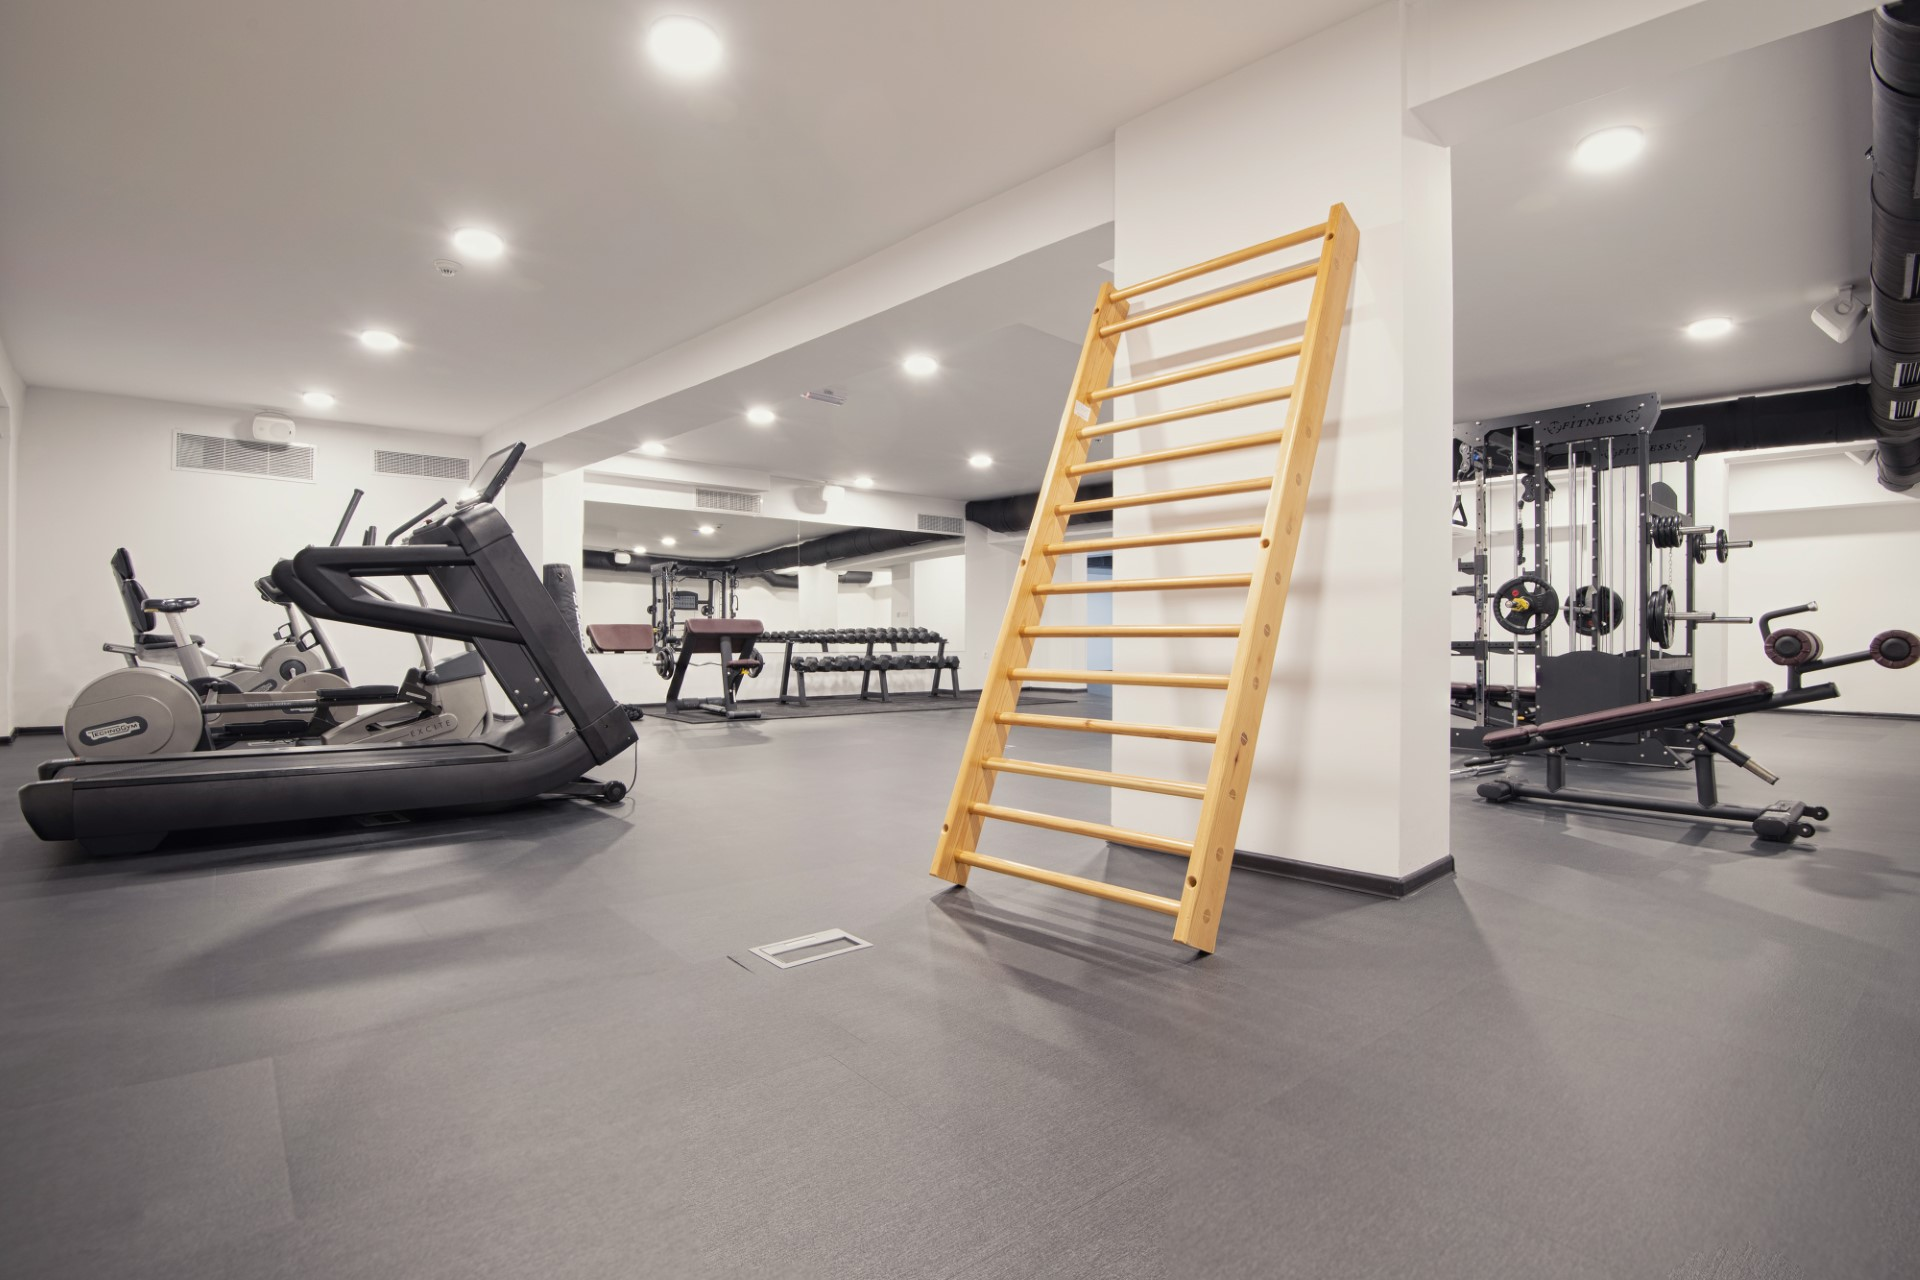 Marea hotel Fitness dvorana fav (4)